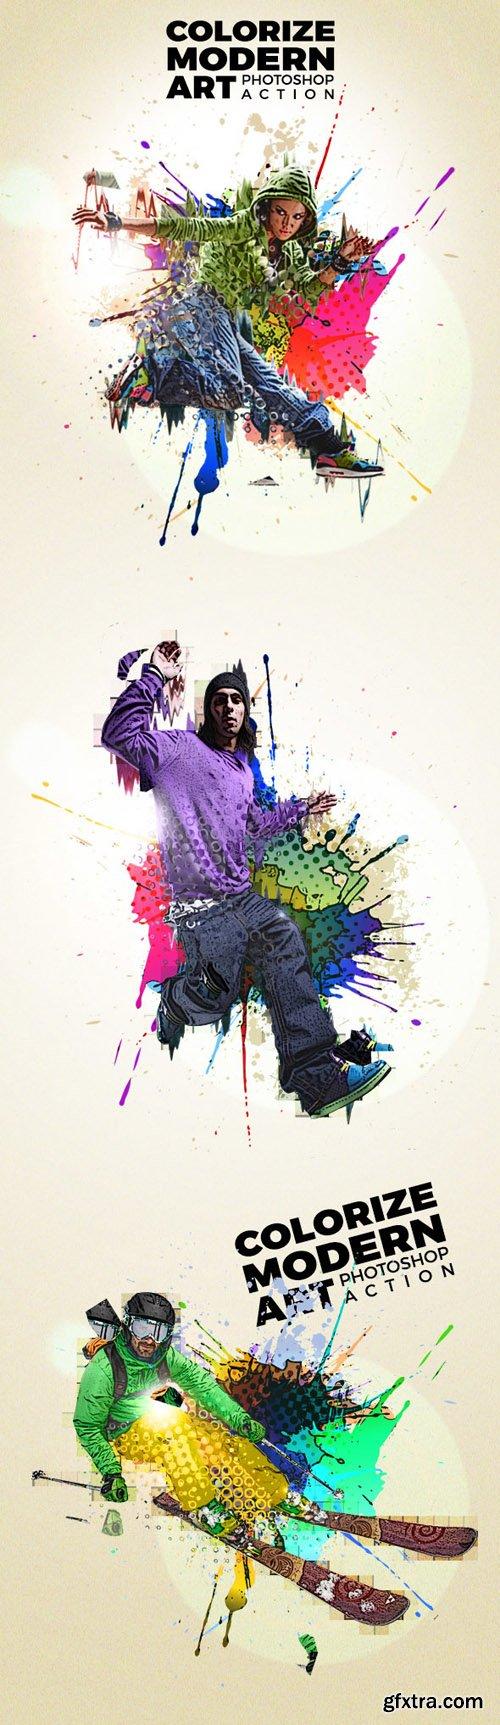 Graphicriver Colorize Modern Art Photoshop Action 14012929